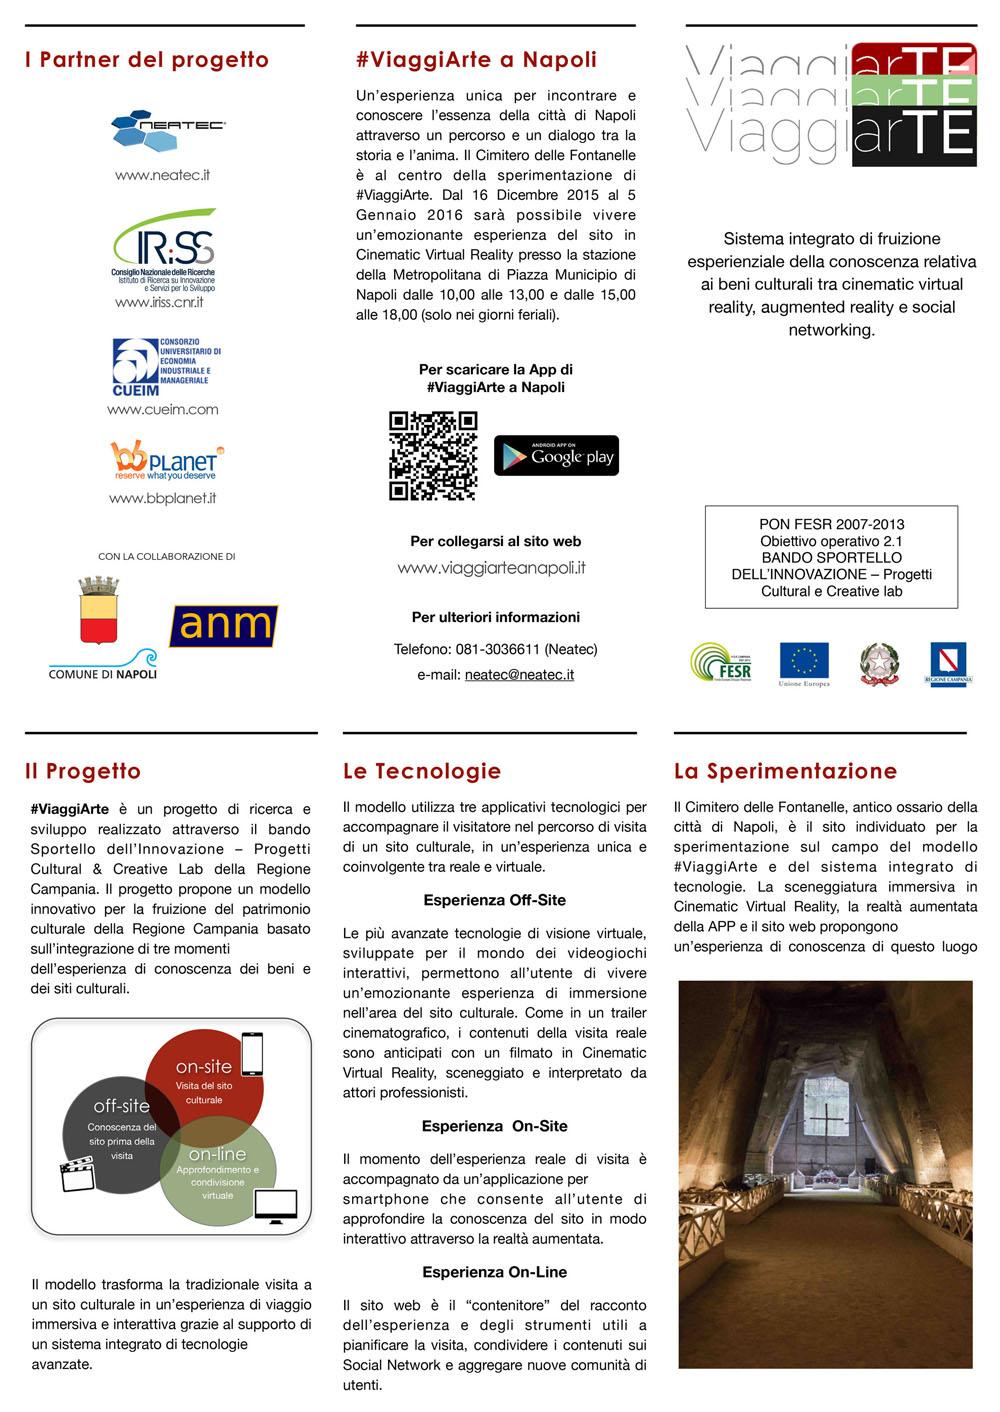 brochure_viaggiarte